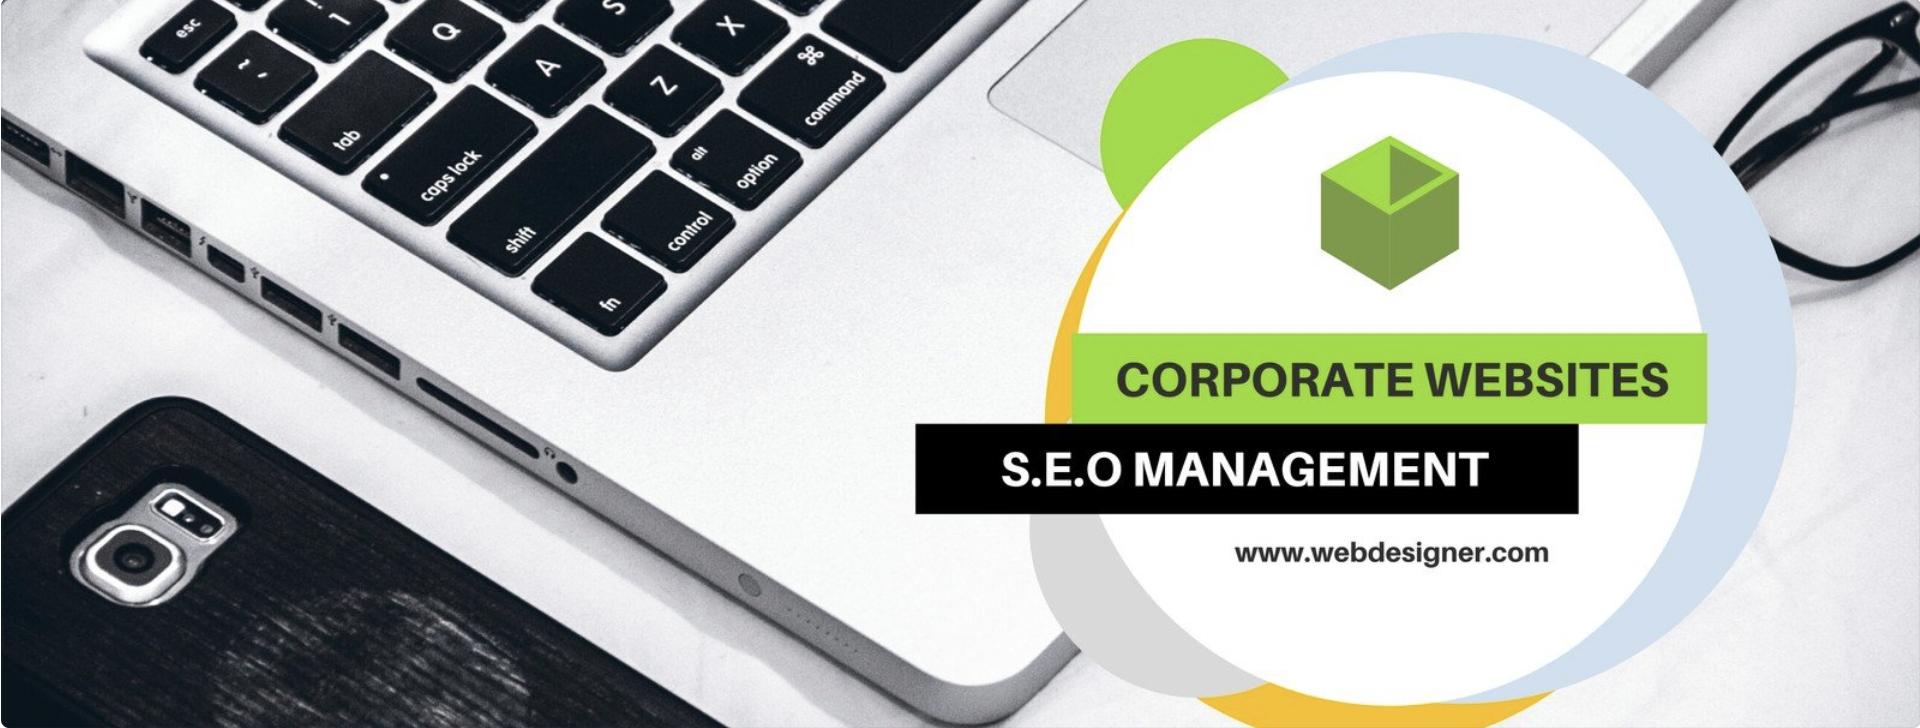 Corporate Website Facebook Cover